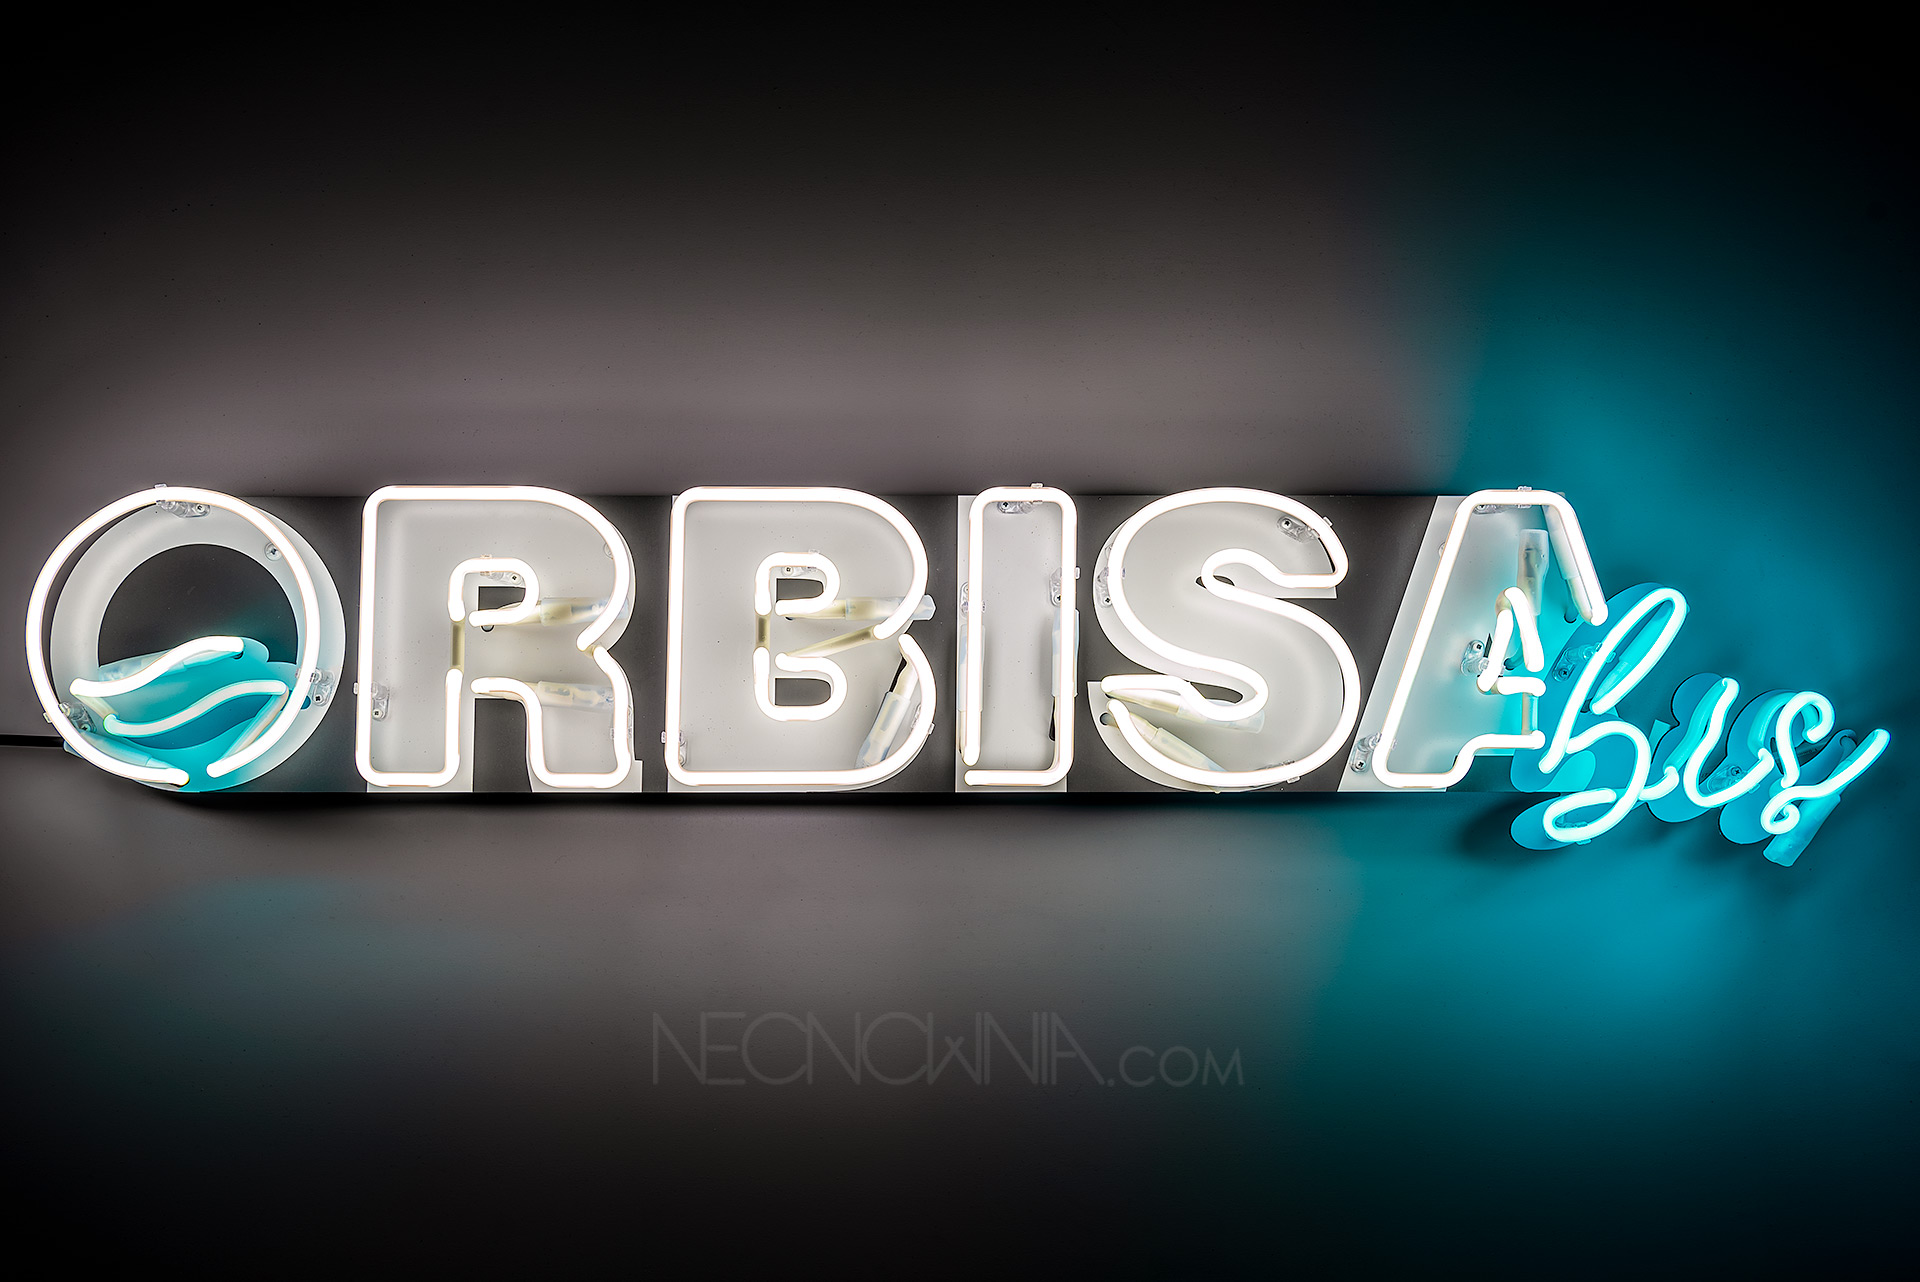 ORBISA BIS